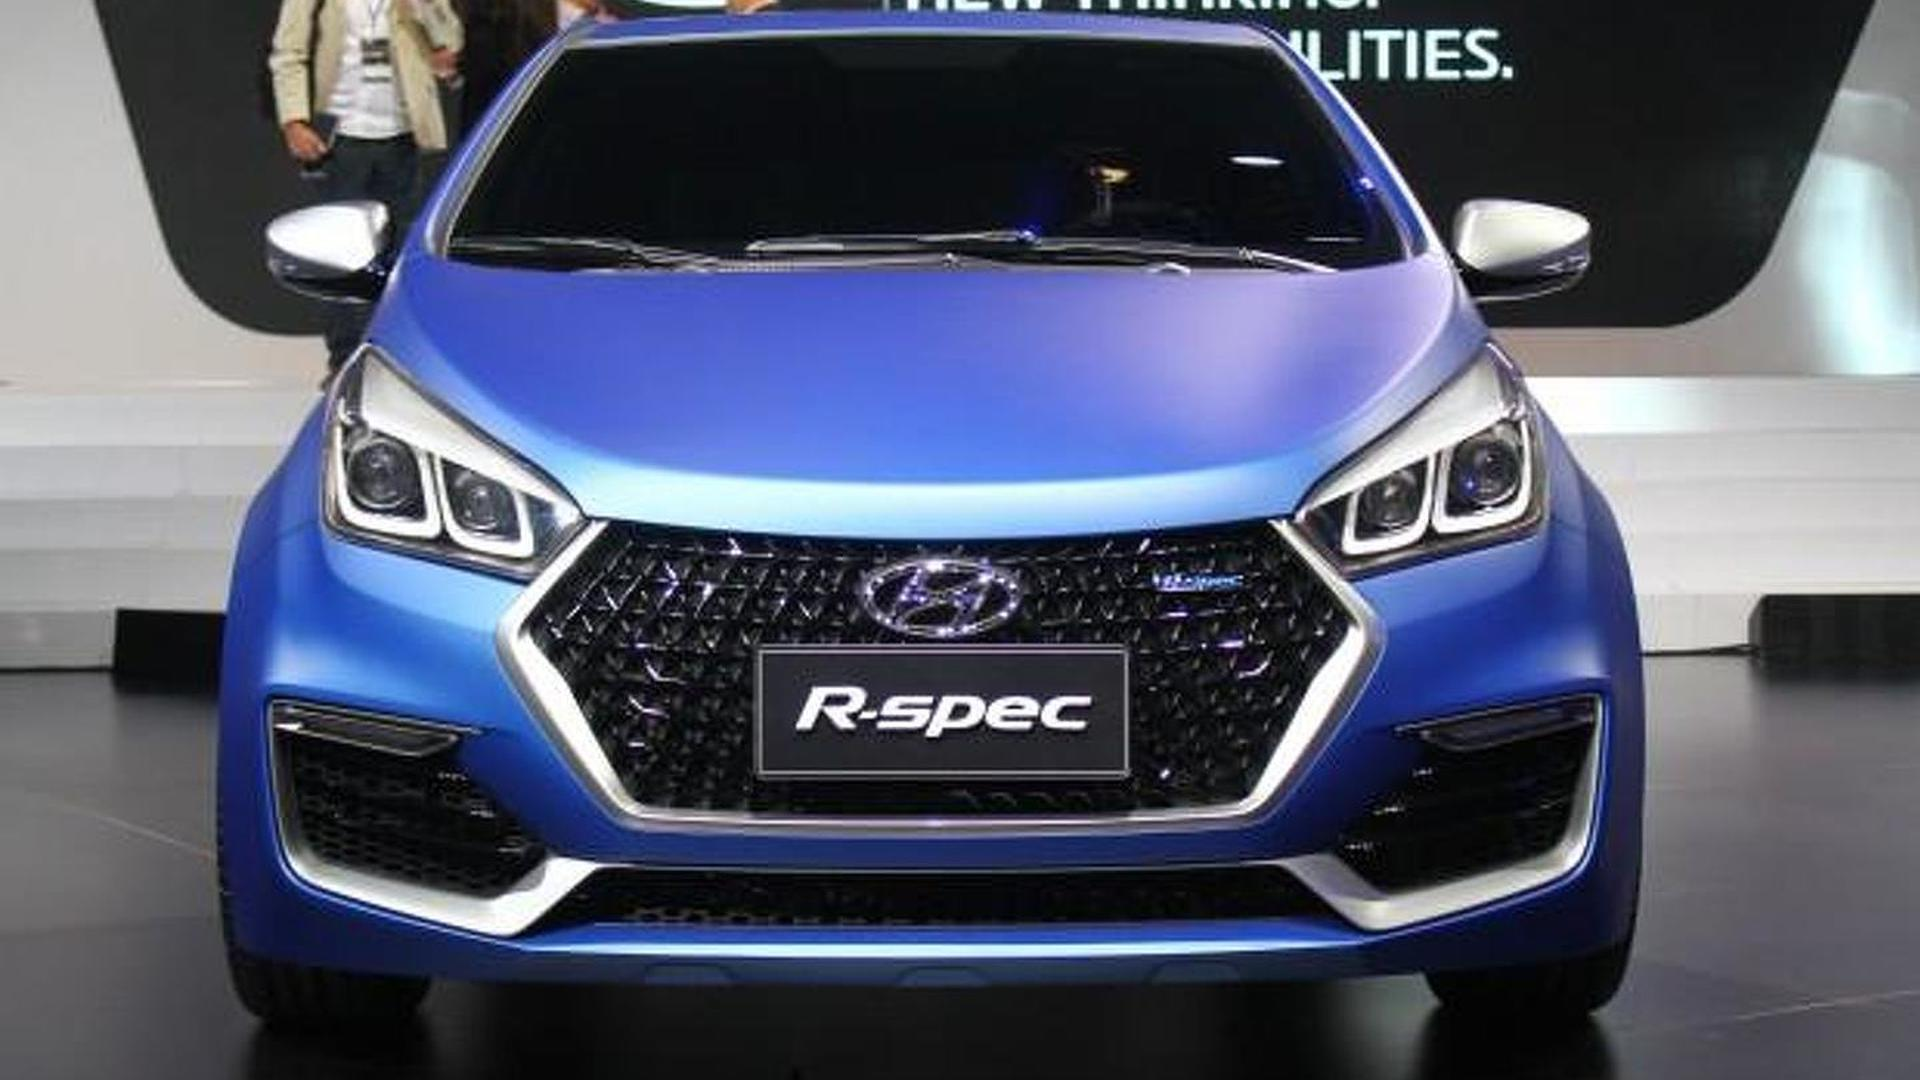 Hyundai HB20 R-Spec revealed in Sao Paulo